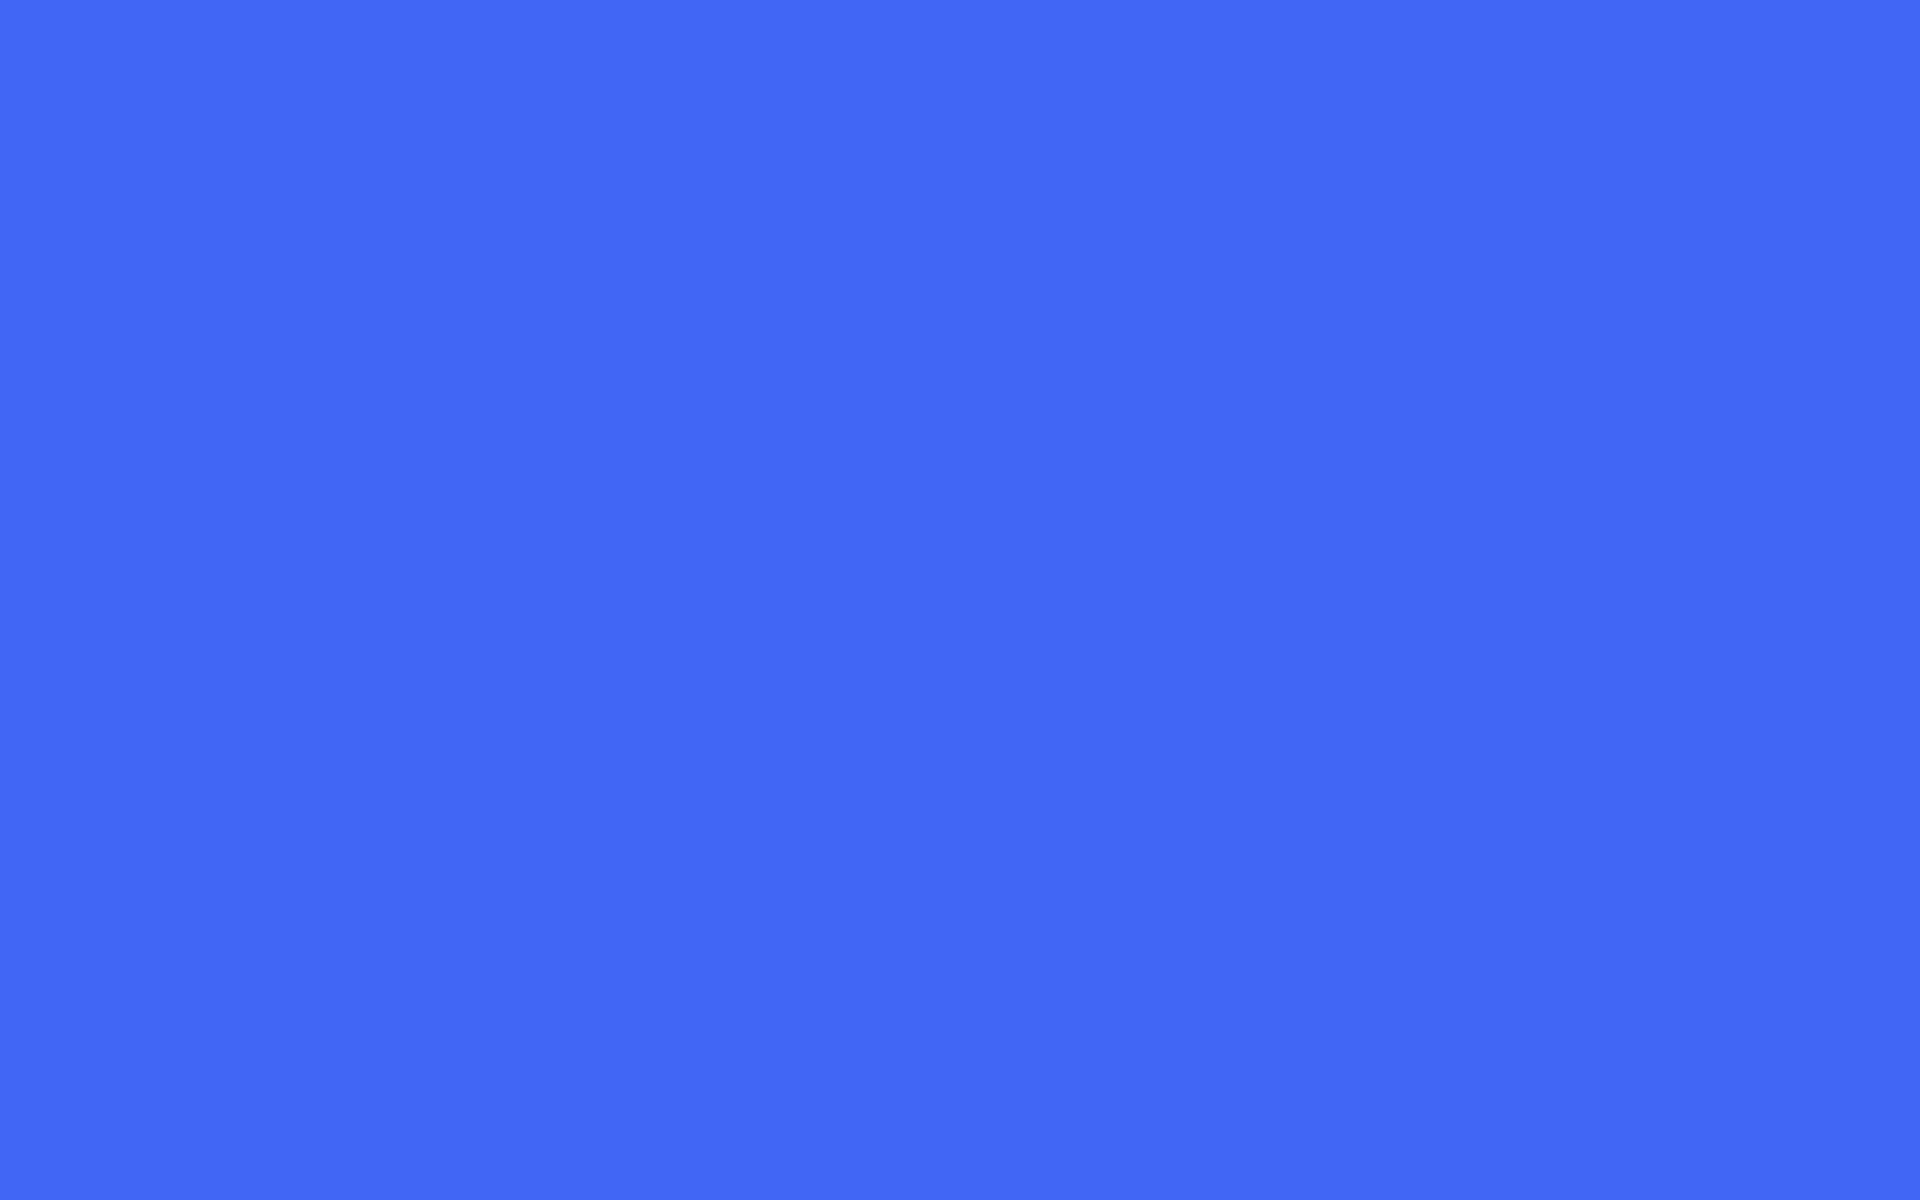 1920x1200 Ultramarine Blue Solid Color Background